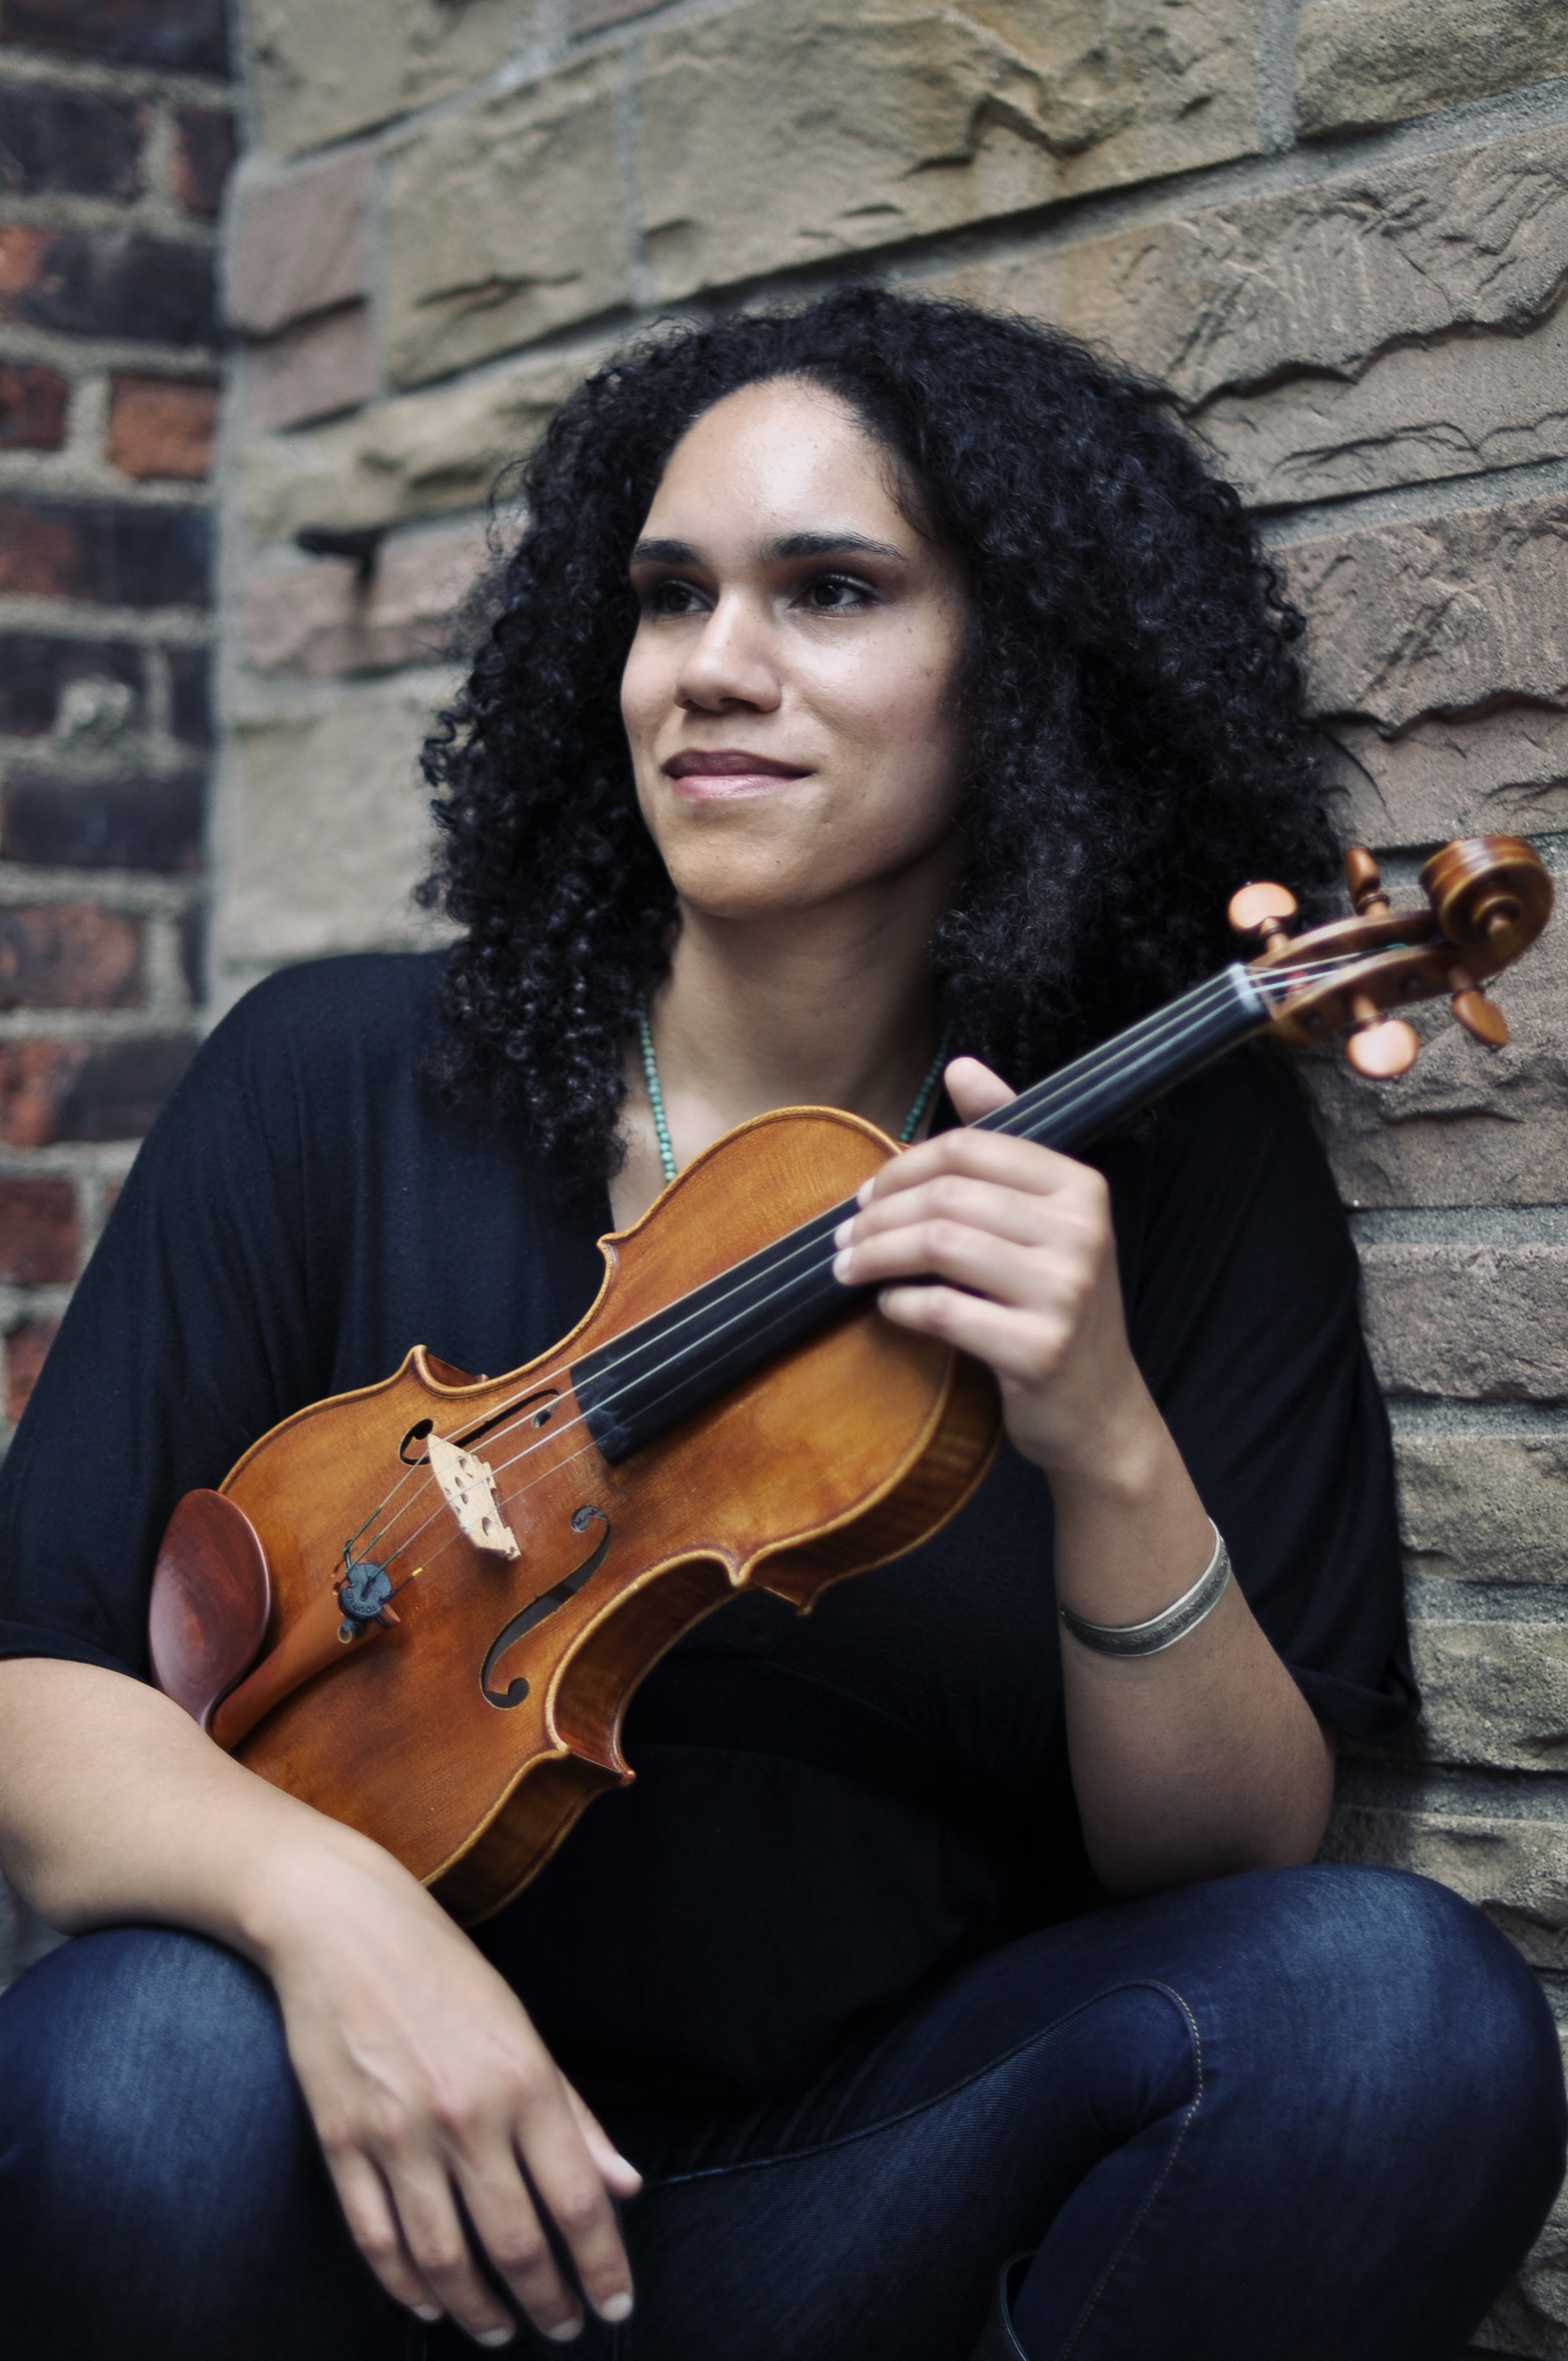 Violin goes missing on NJ transit